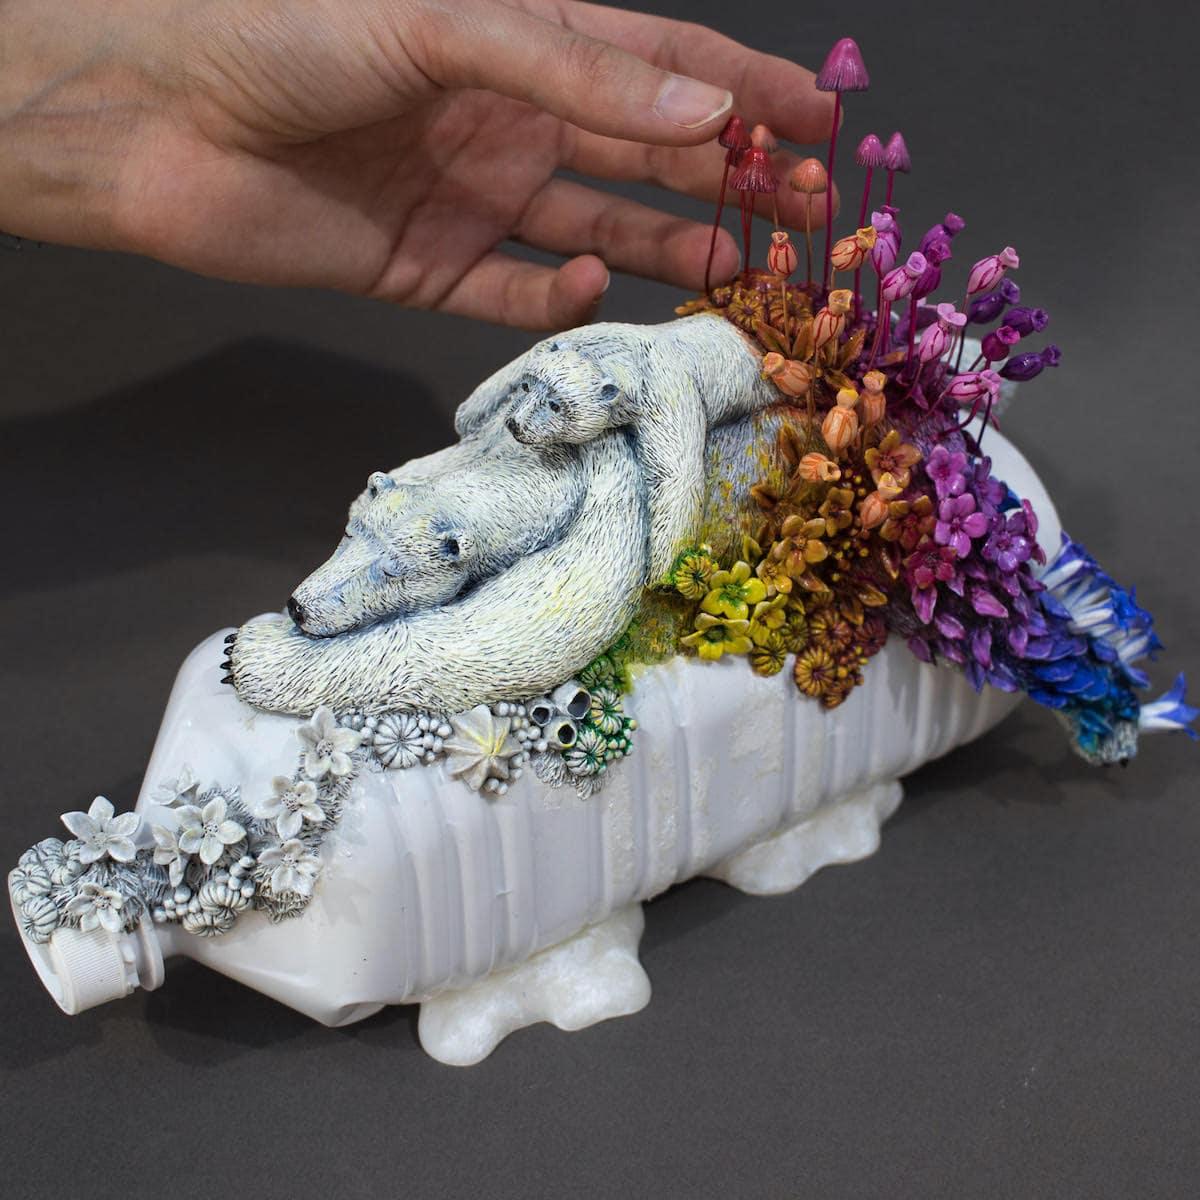 Miniature Art Exhibition